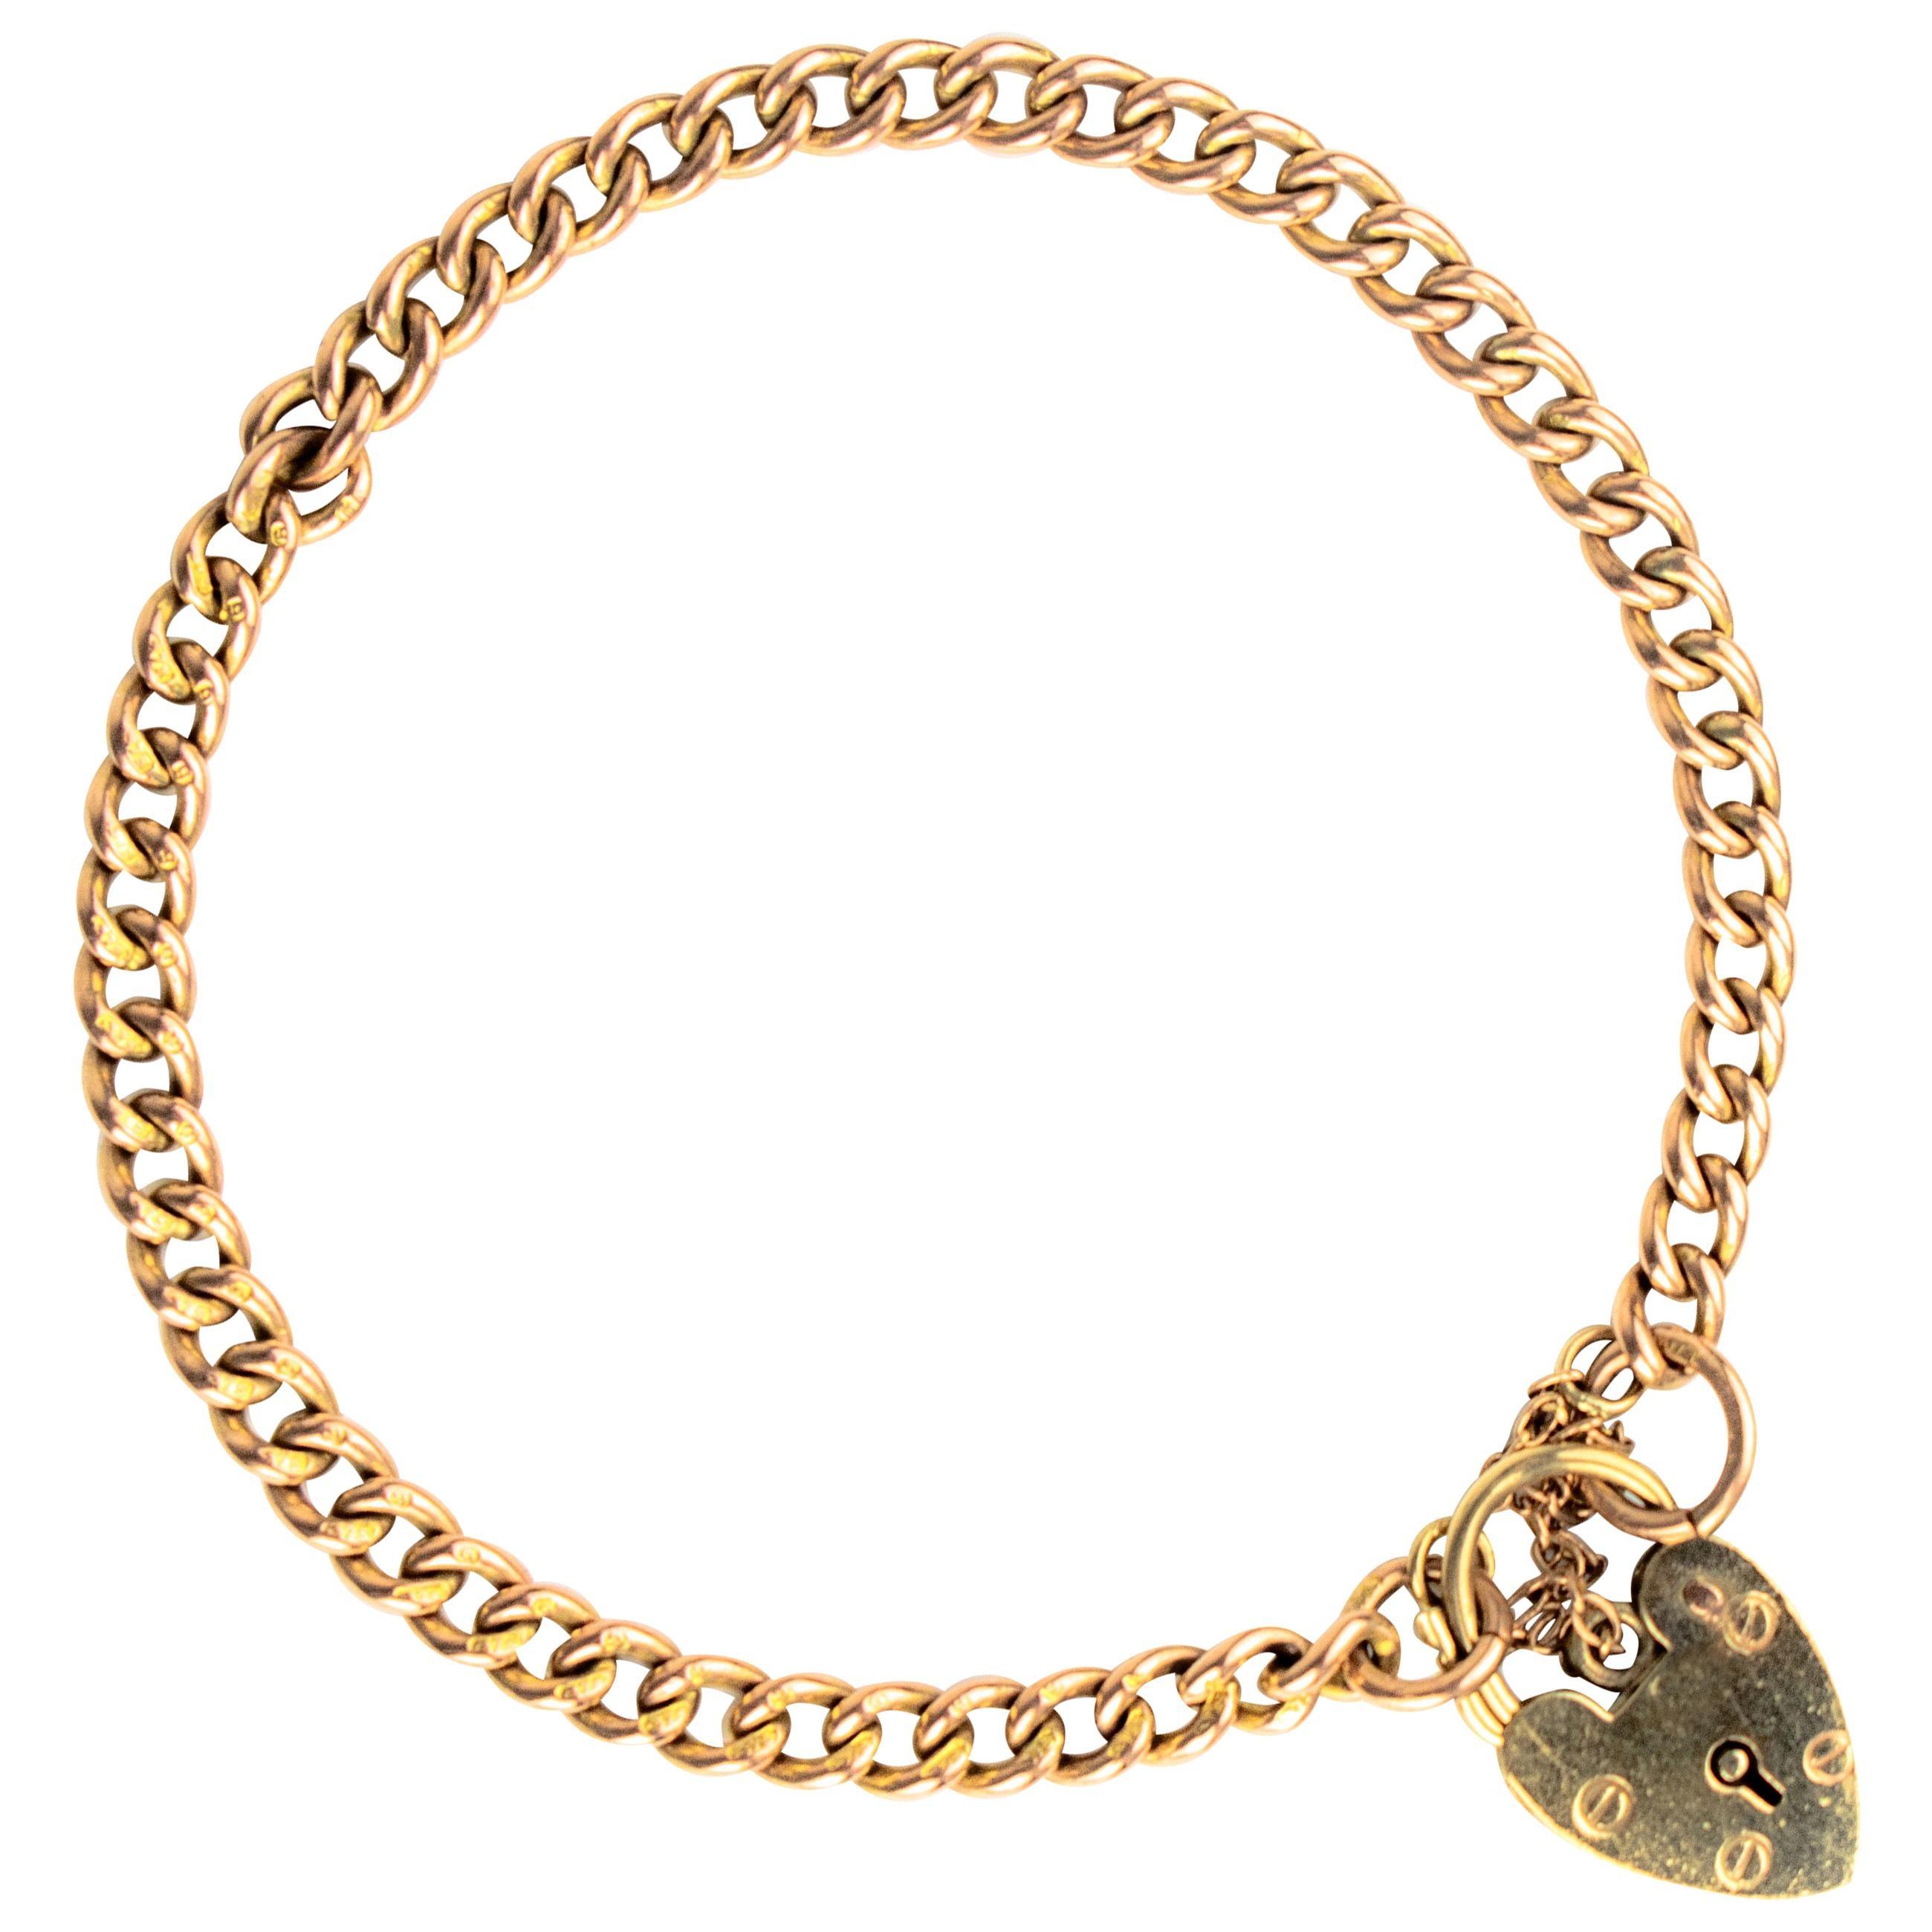 English 9 Karat Rose Gold Charm Bracelet, Birmingham, 1970s